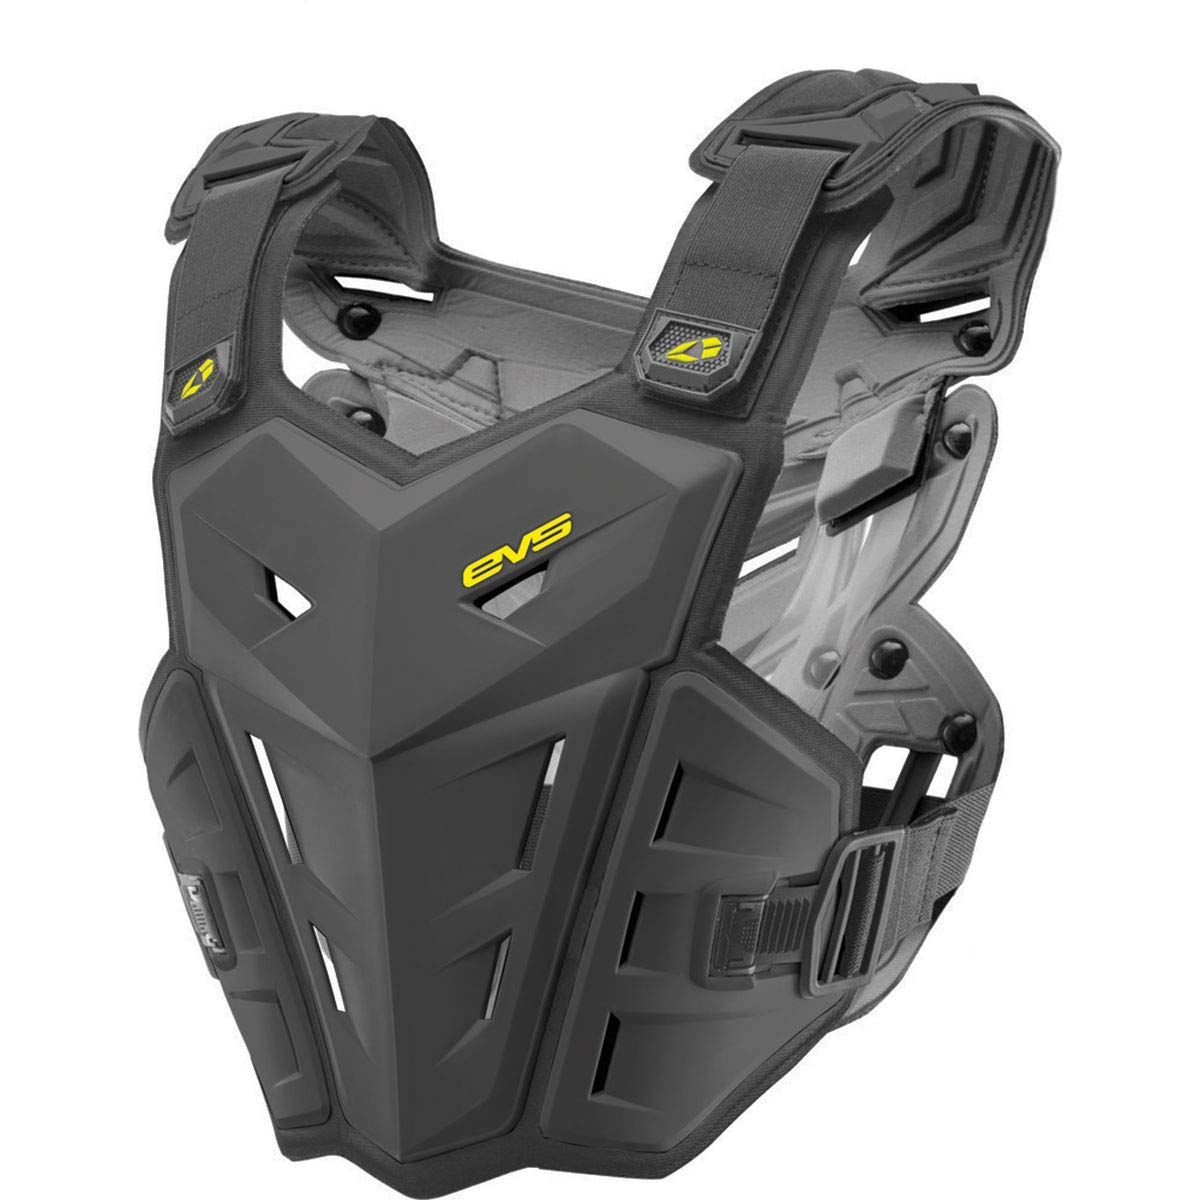 EVS F1 Adult Roost Guard MotoX/Off-Road/Dirt Bike Motorcycle Vest - Black/Small/Medium